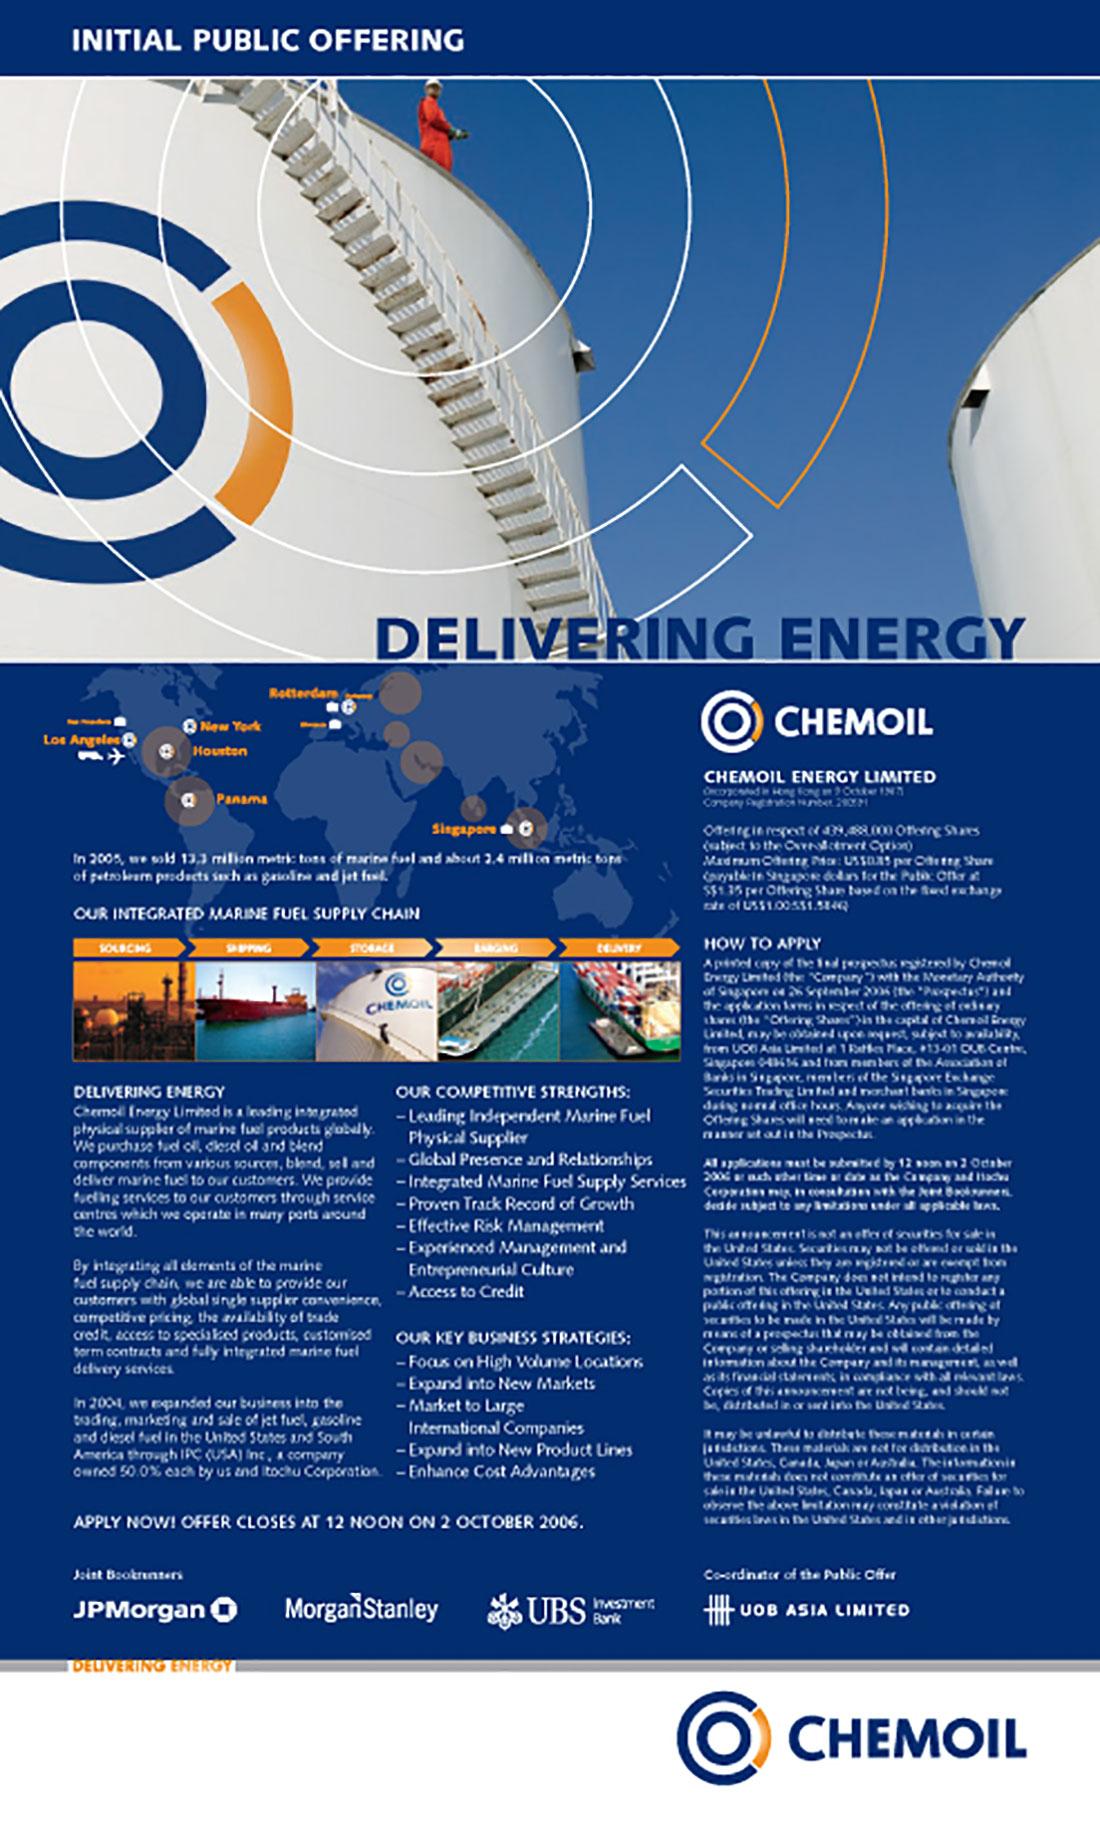 DIA | Chemoil | Branding | Brand Strategy & Design | Energy Company